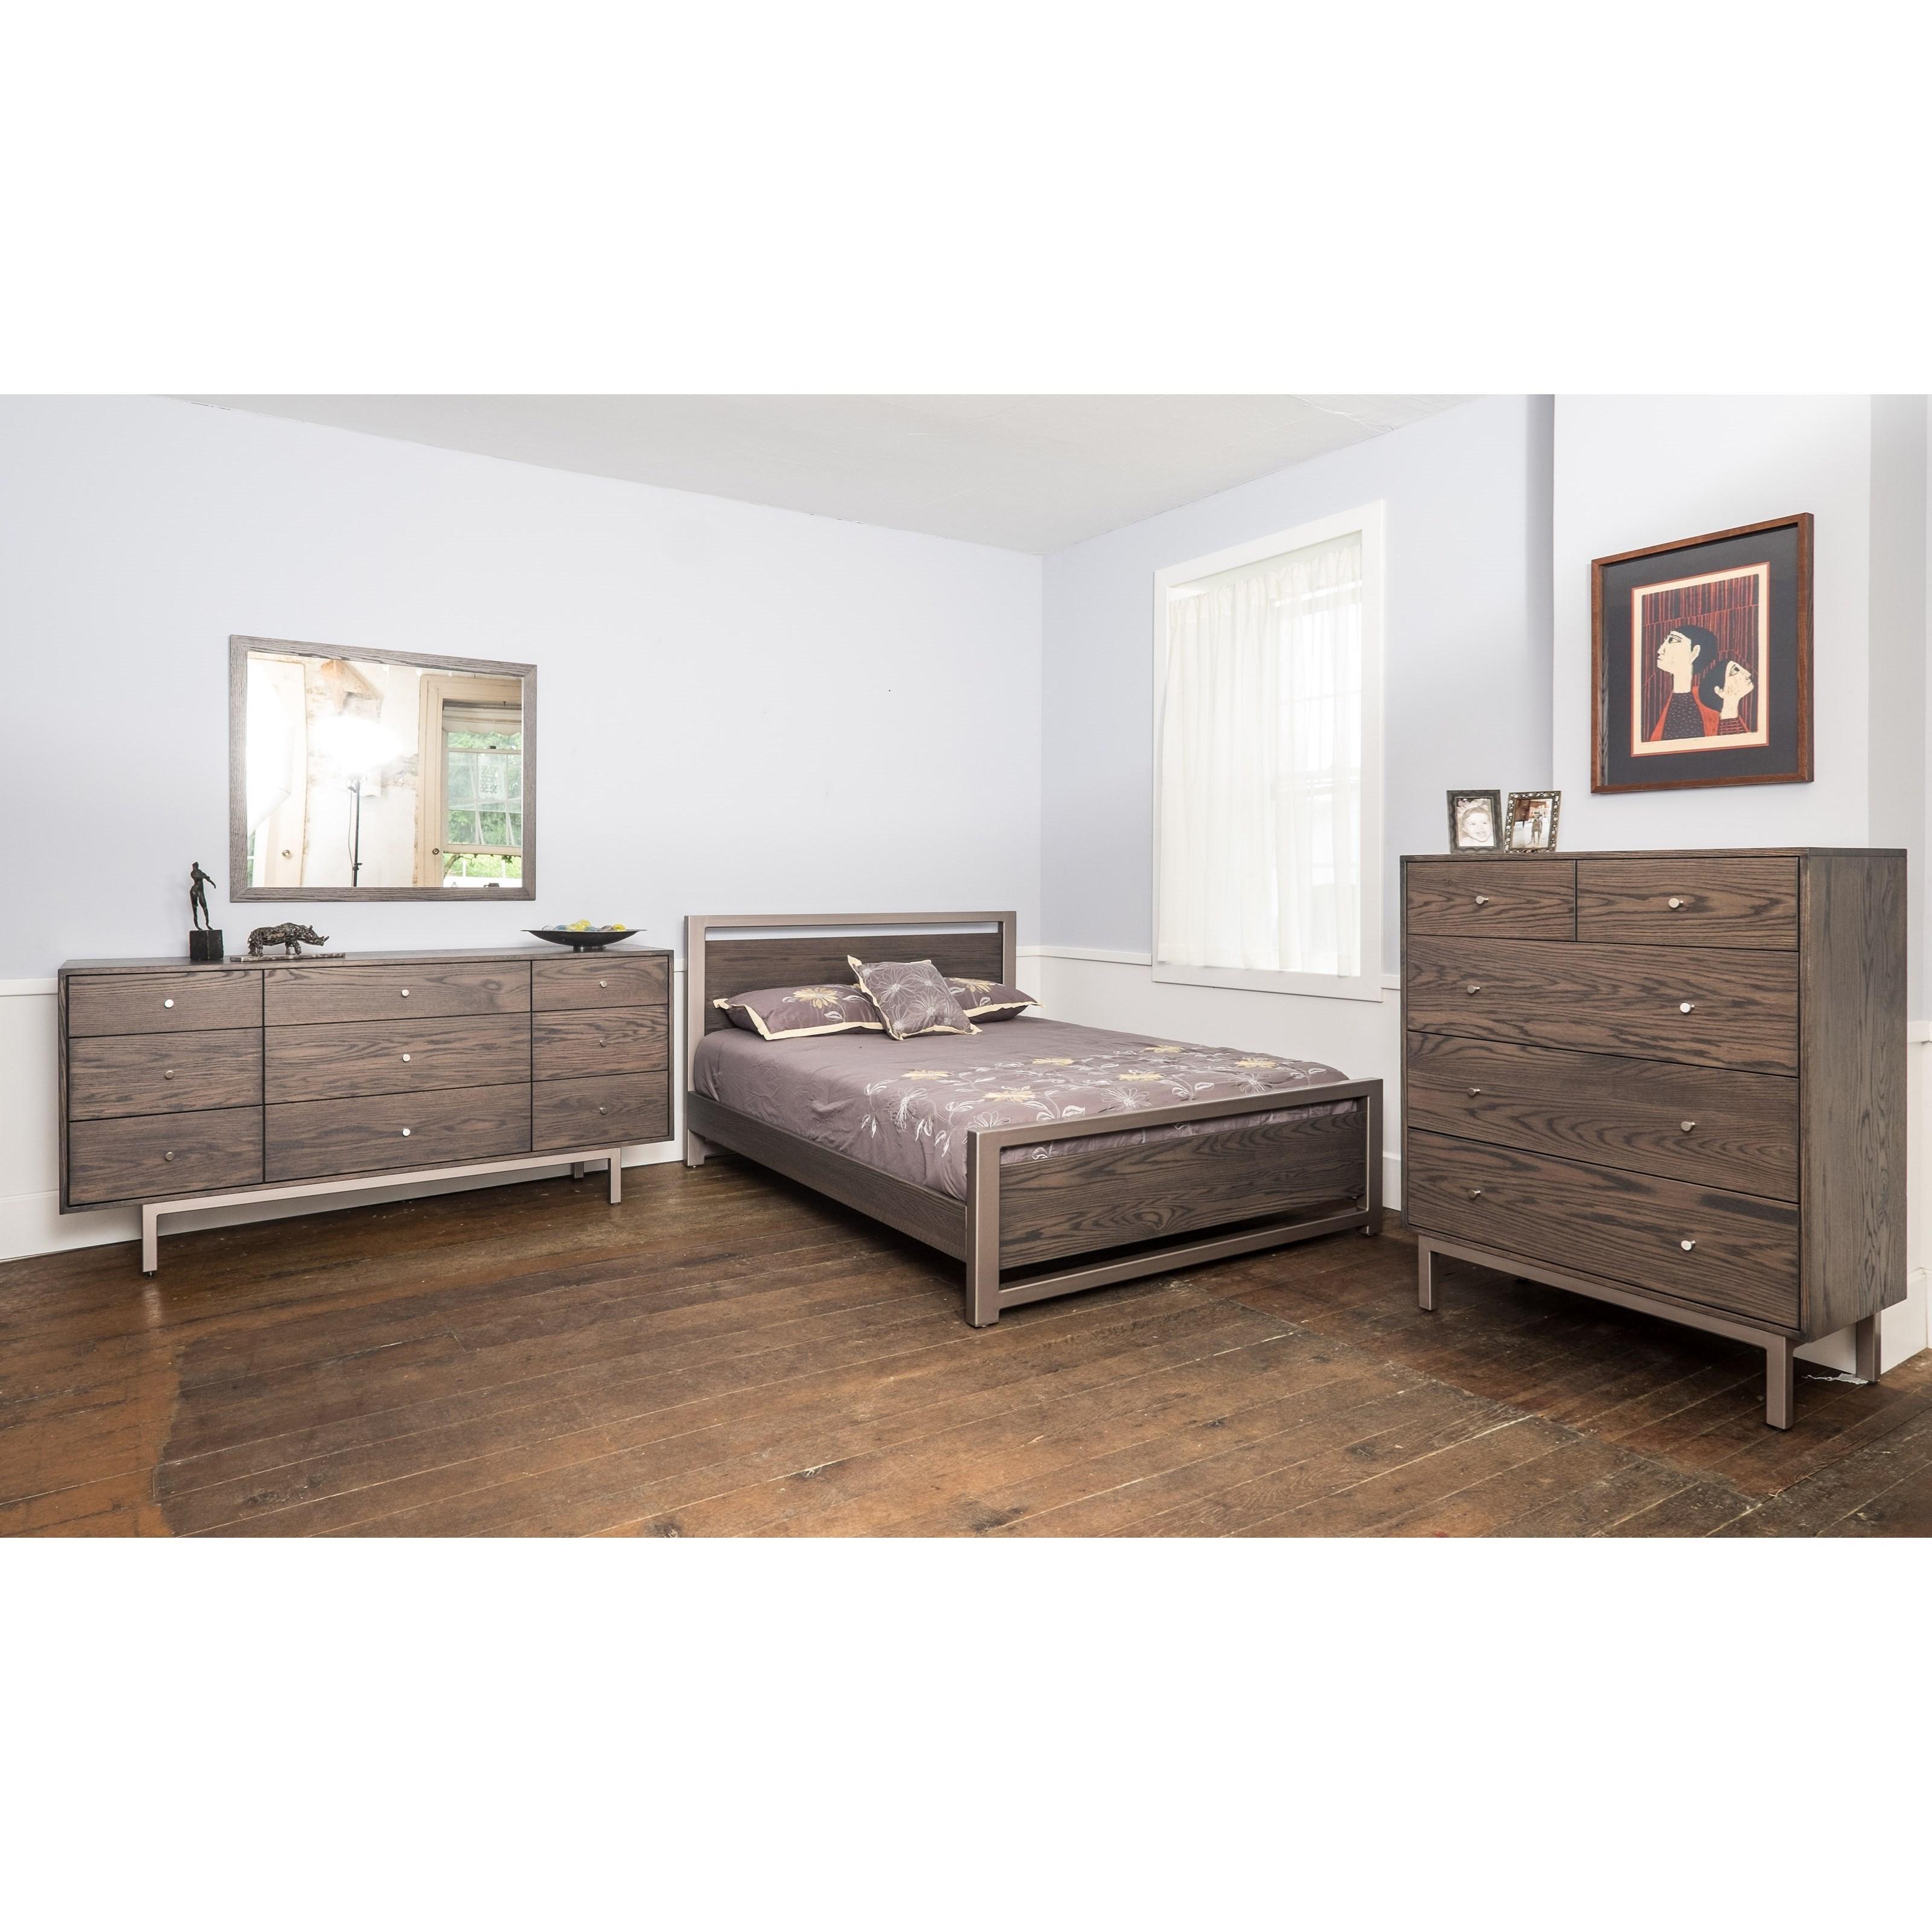 Sullivan Cove Customizable Queen Bedroom Group by Glenmont Furniture at Saugerties Furniture Mart